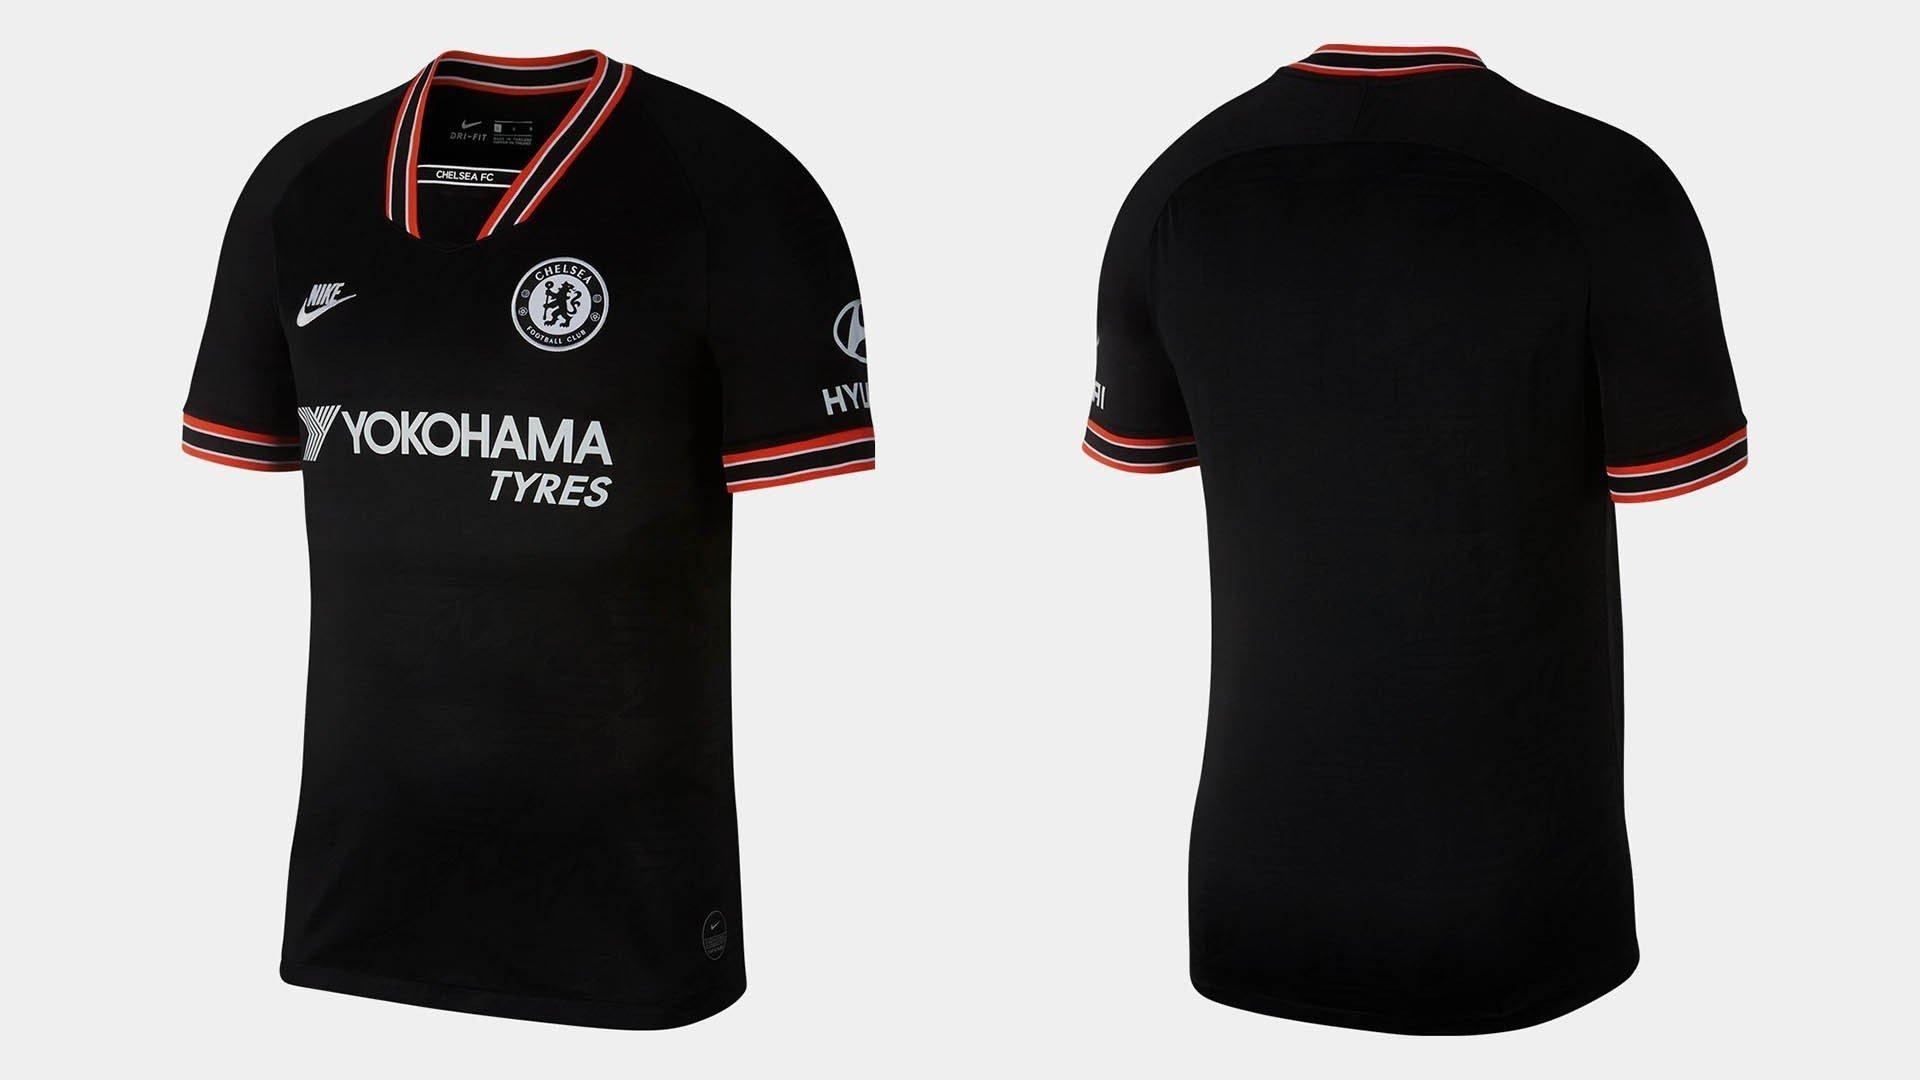 terceiro uniforme chelsea 2019 20